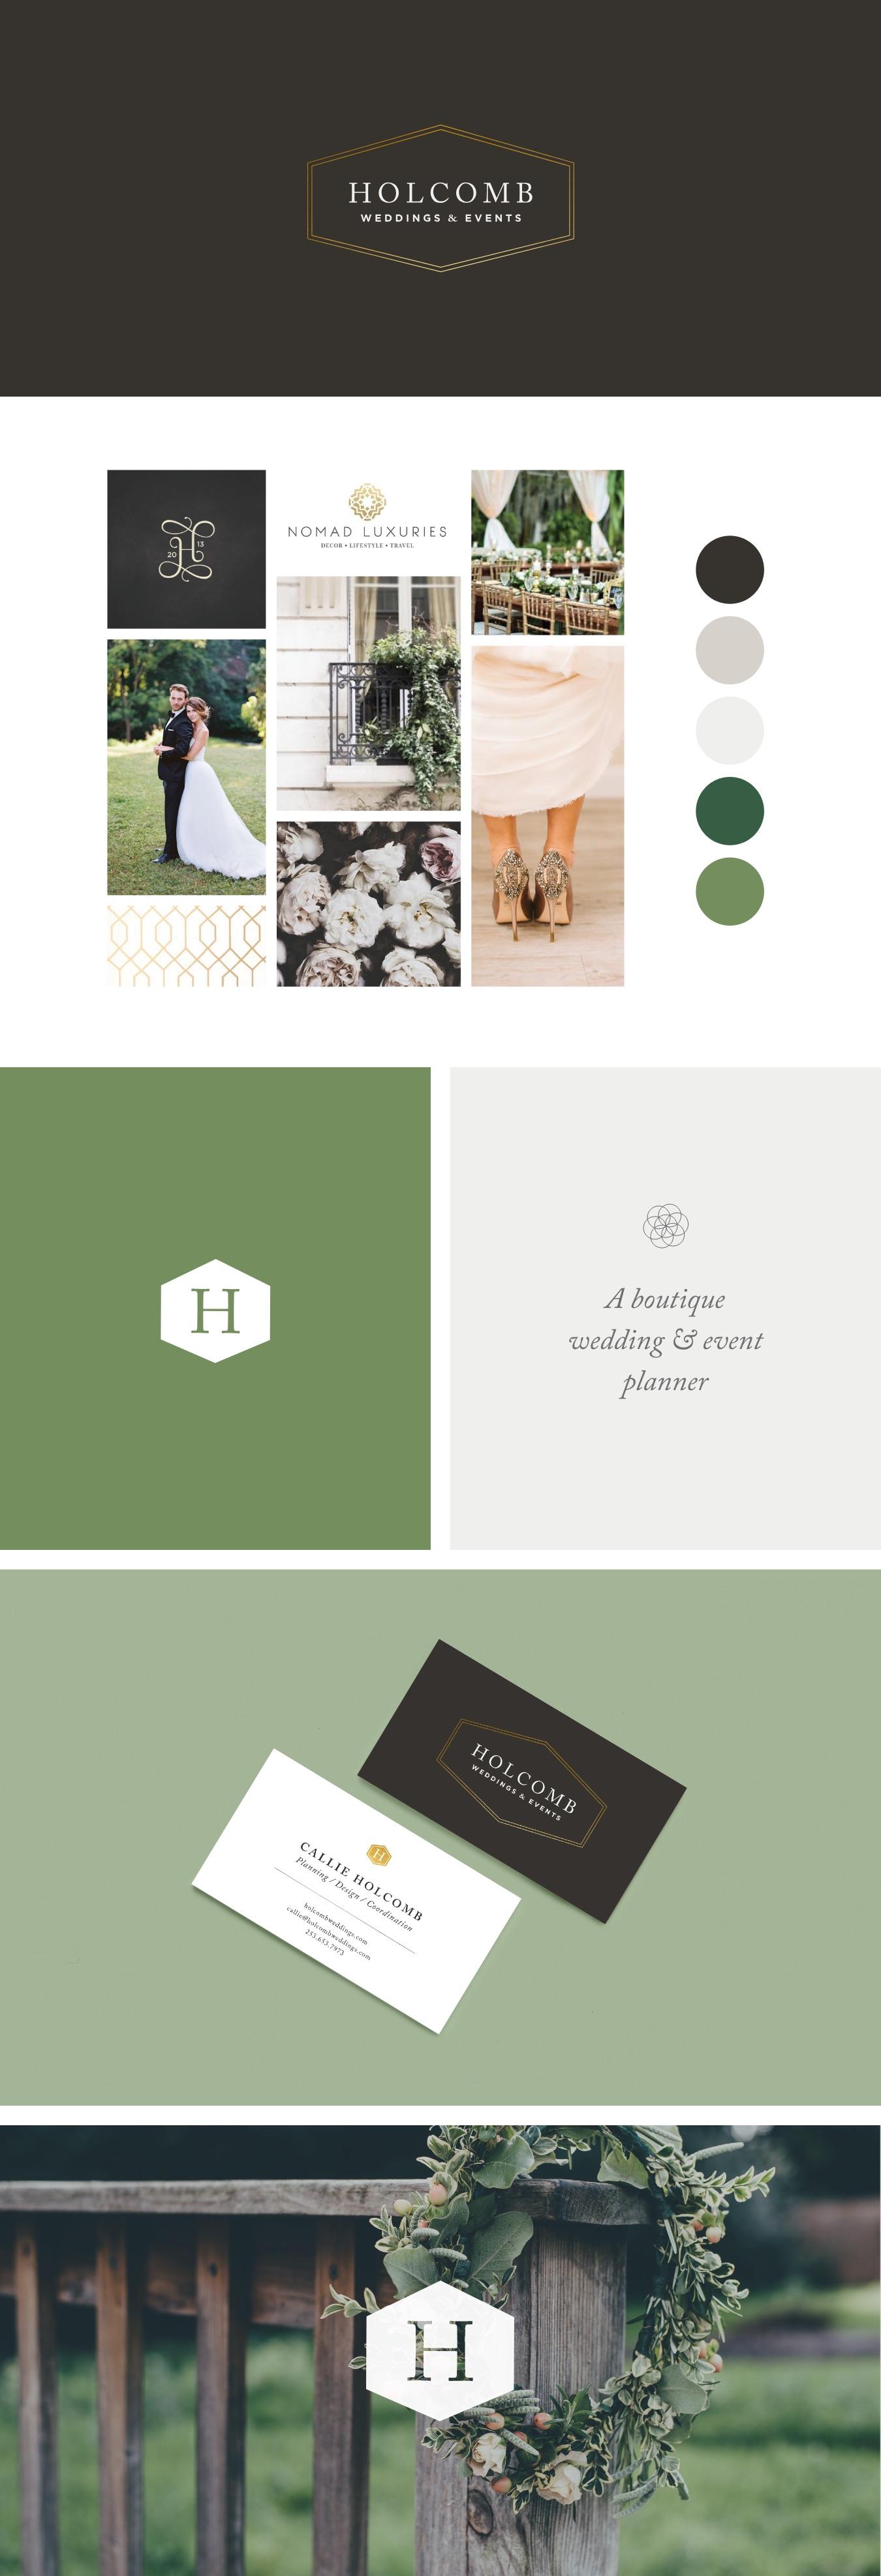 Holcomb Weddings & Events | Brand Design | Samantha Madeo Design